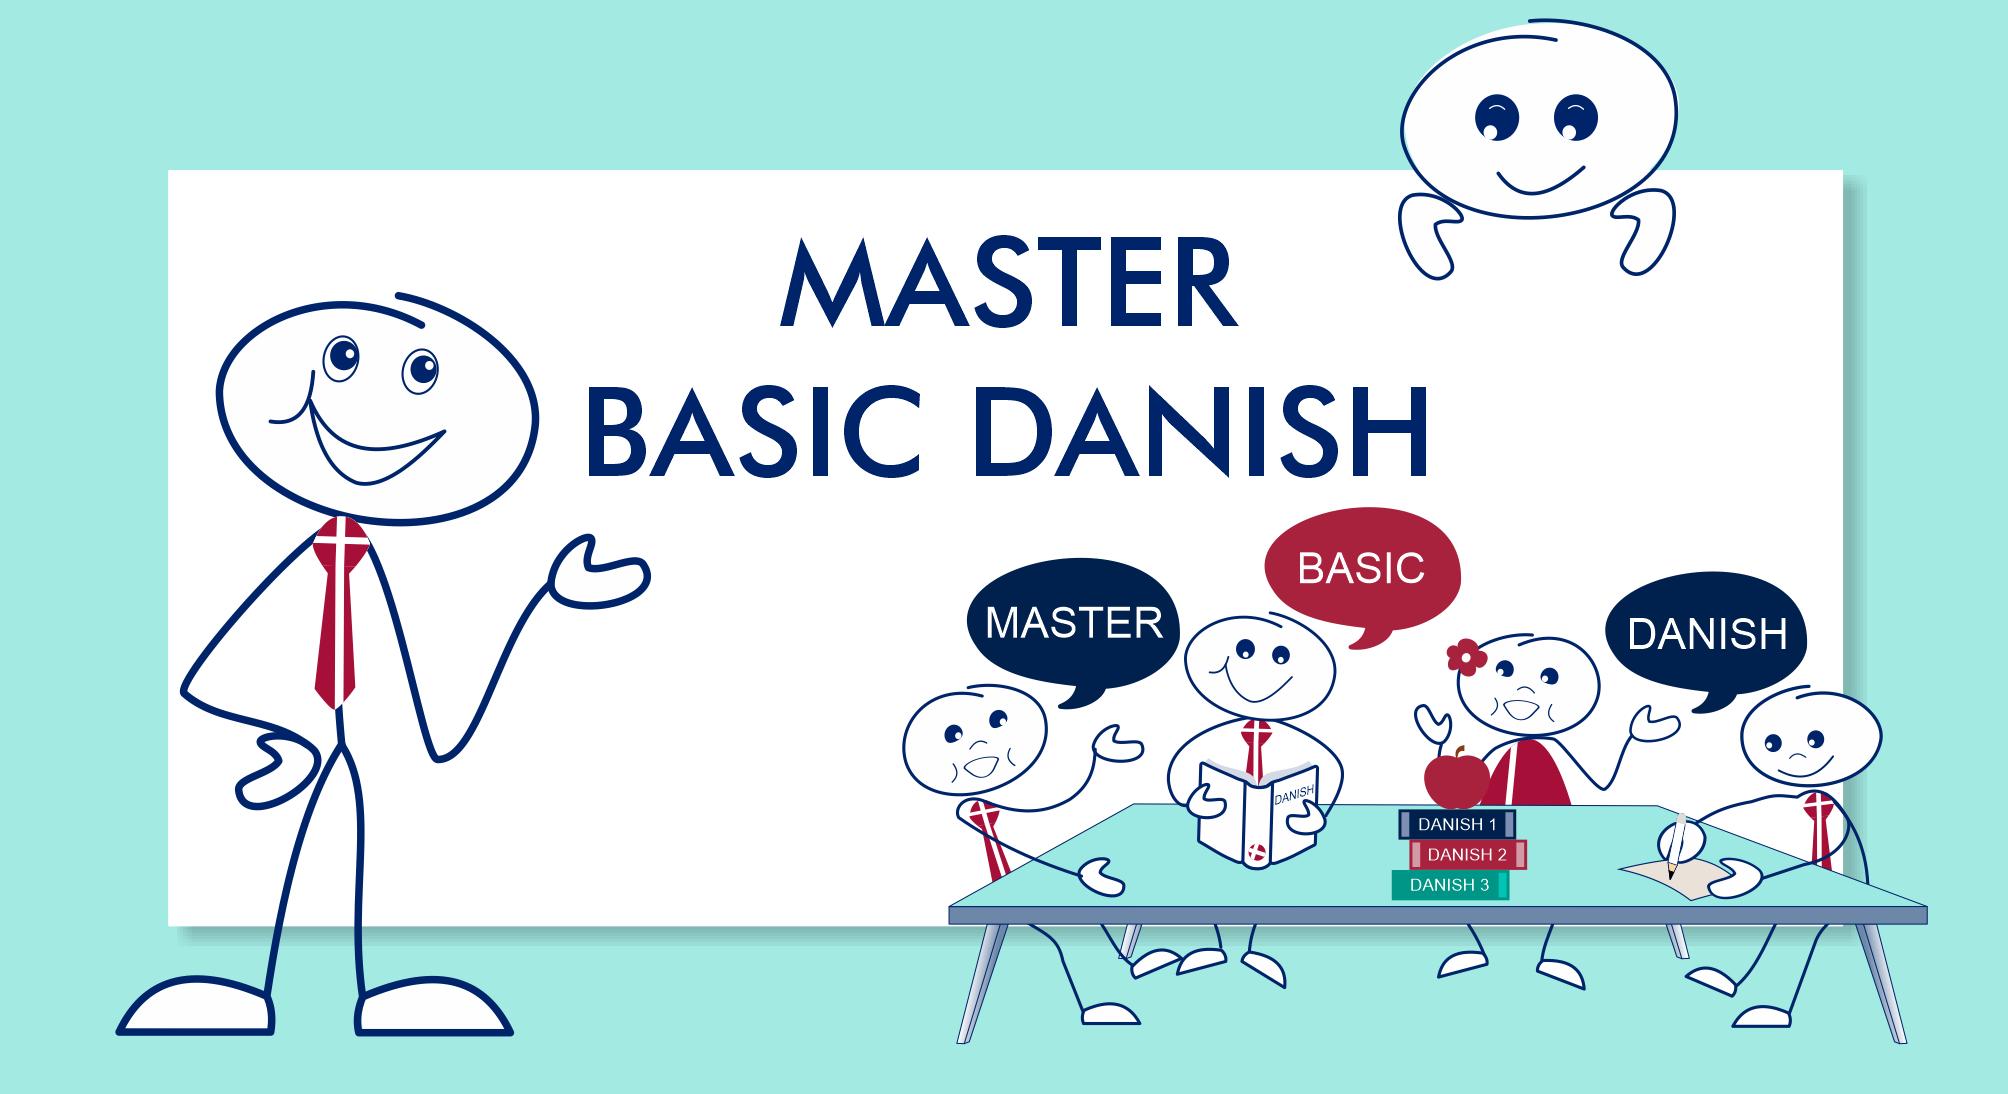 Master basic Danish